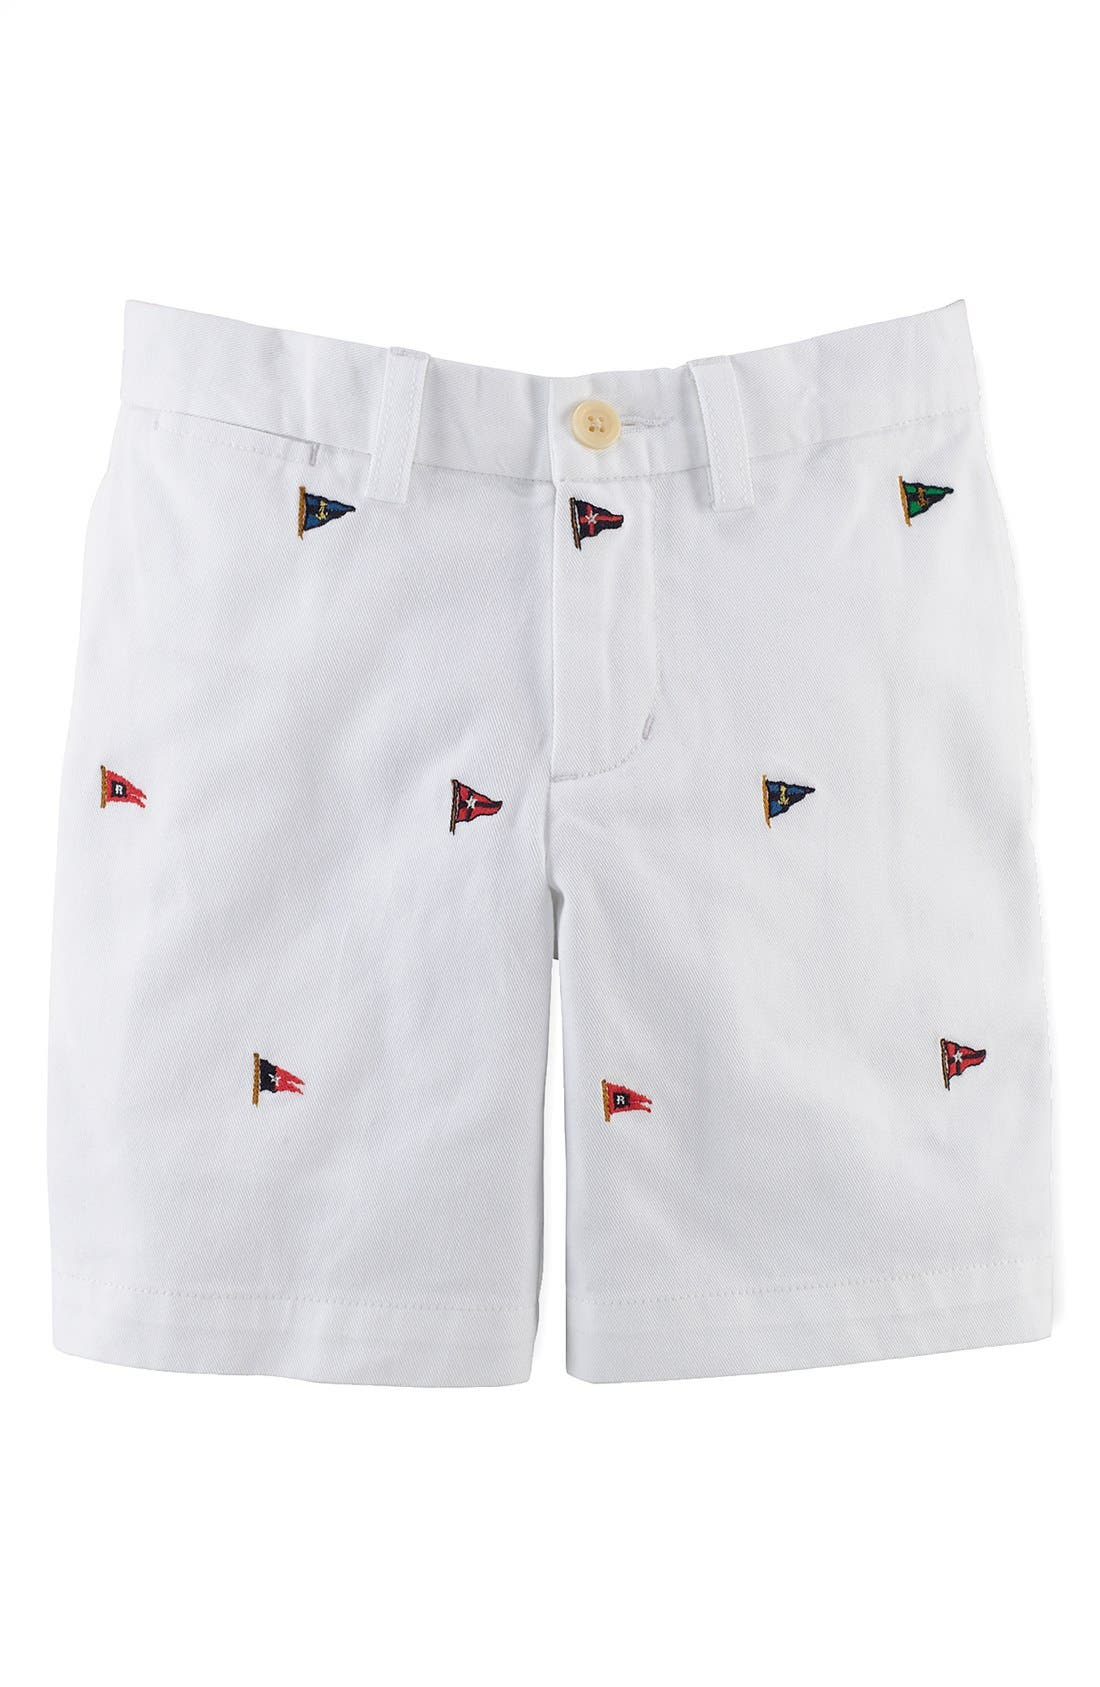 Alternate Image 1 Selected - Ralph Lauren Chino Shorts (Toddler Boys)